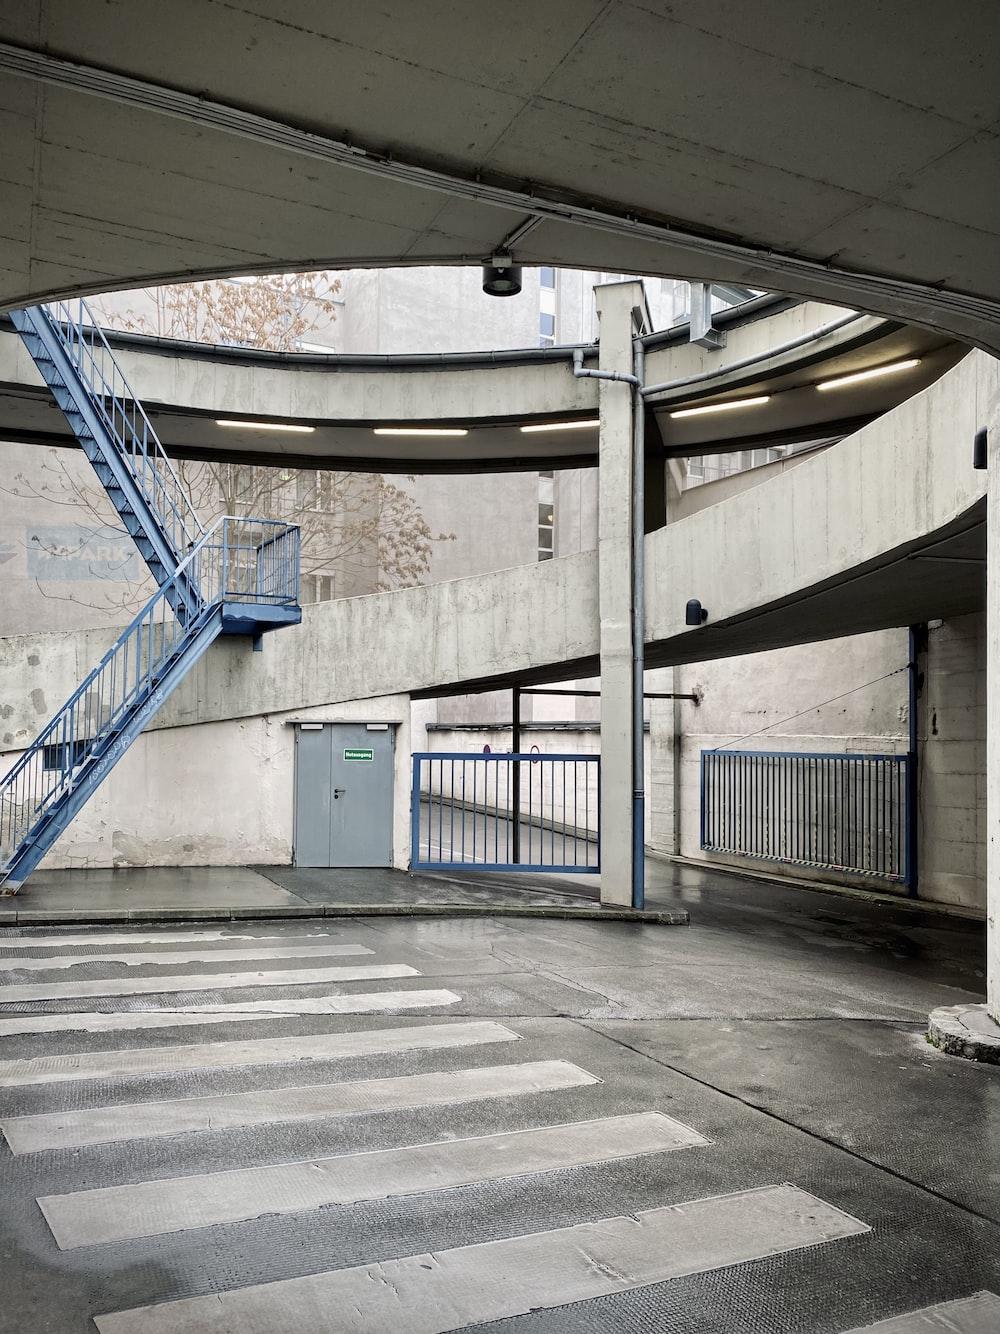 blue metal railings on gray concrete floor